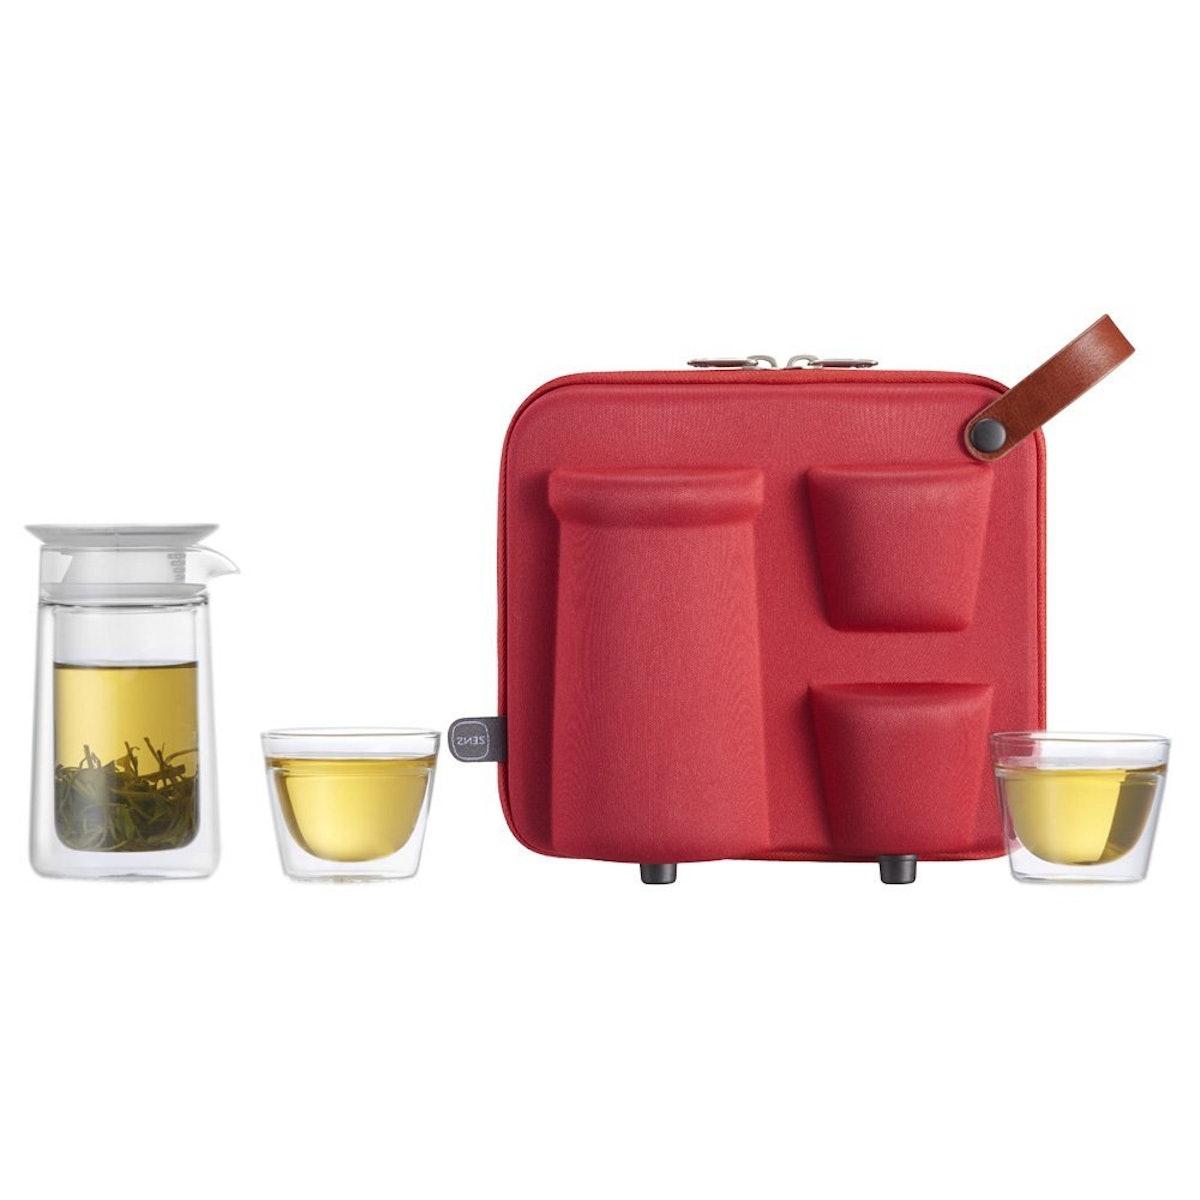 ZENS Portable Travel Tea Set